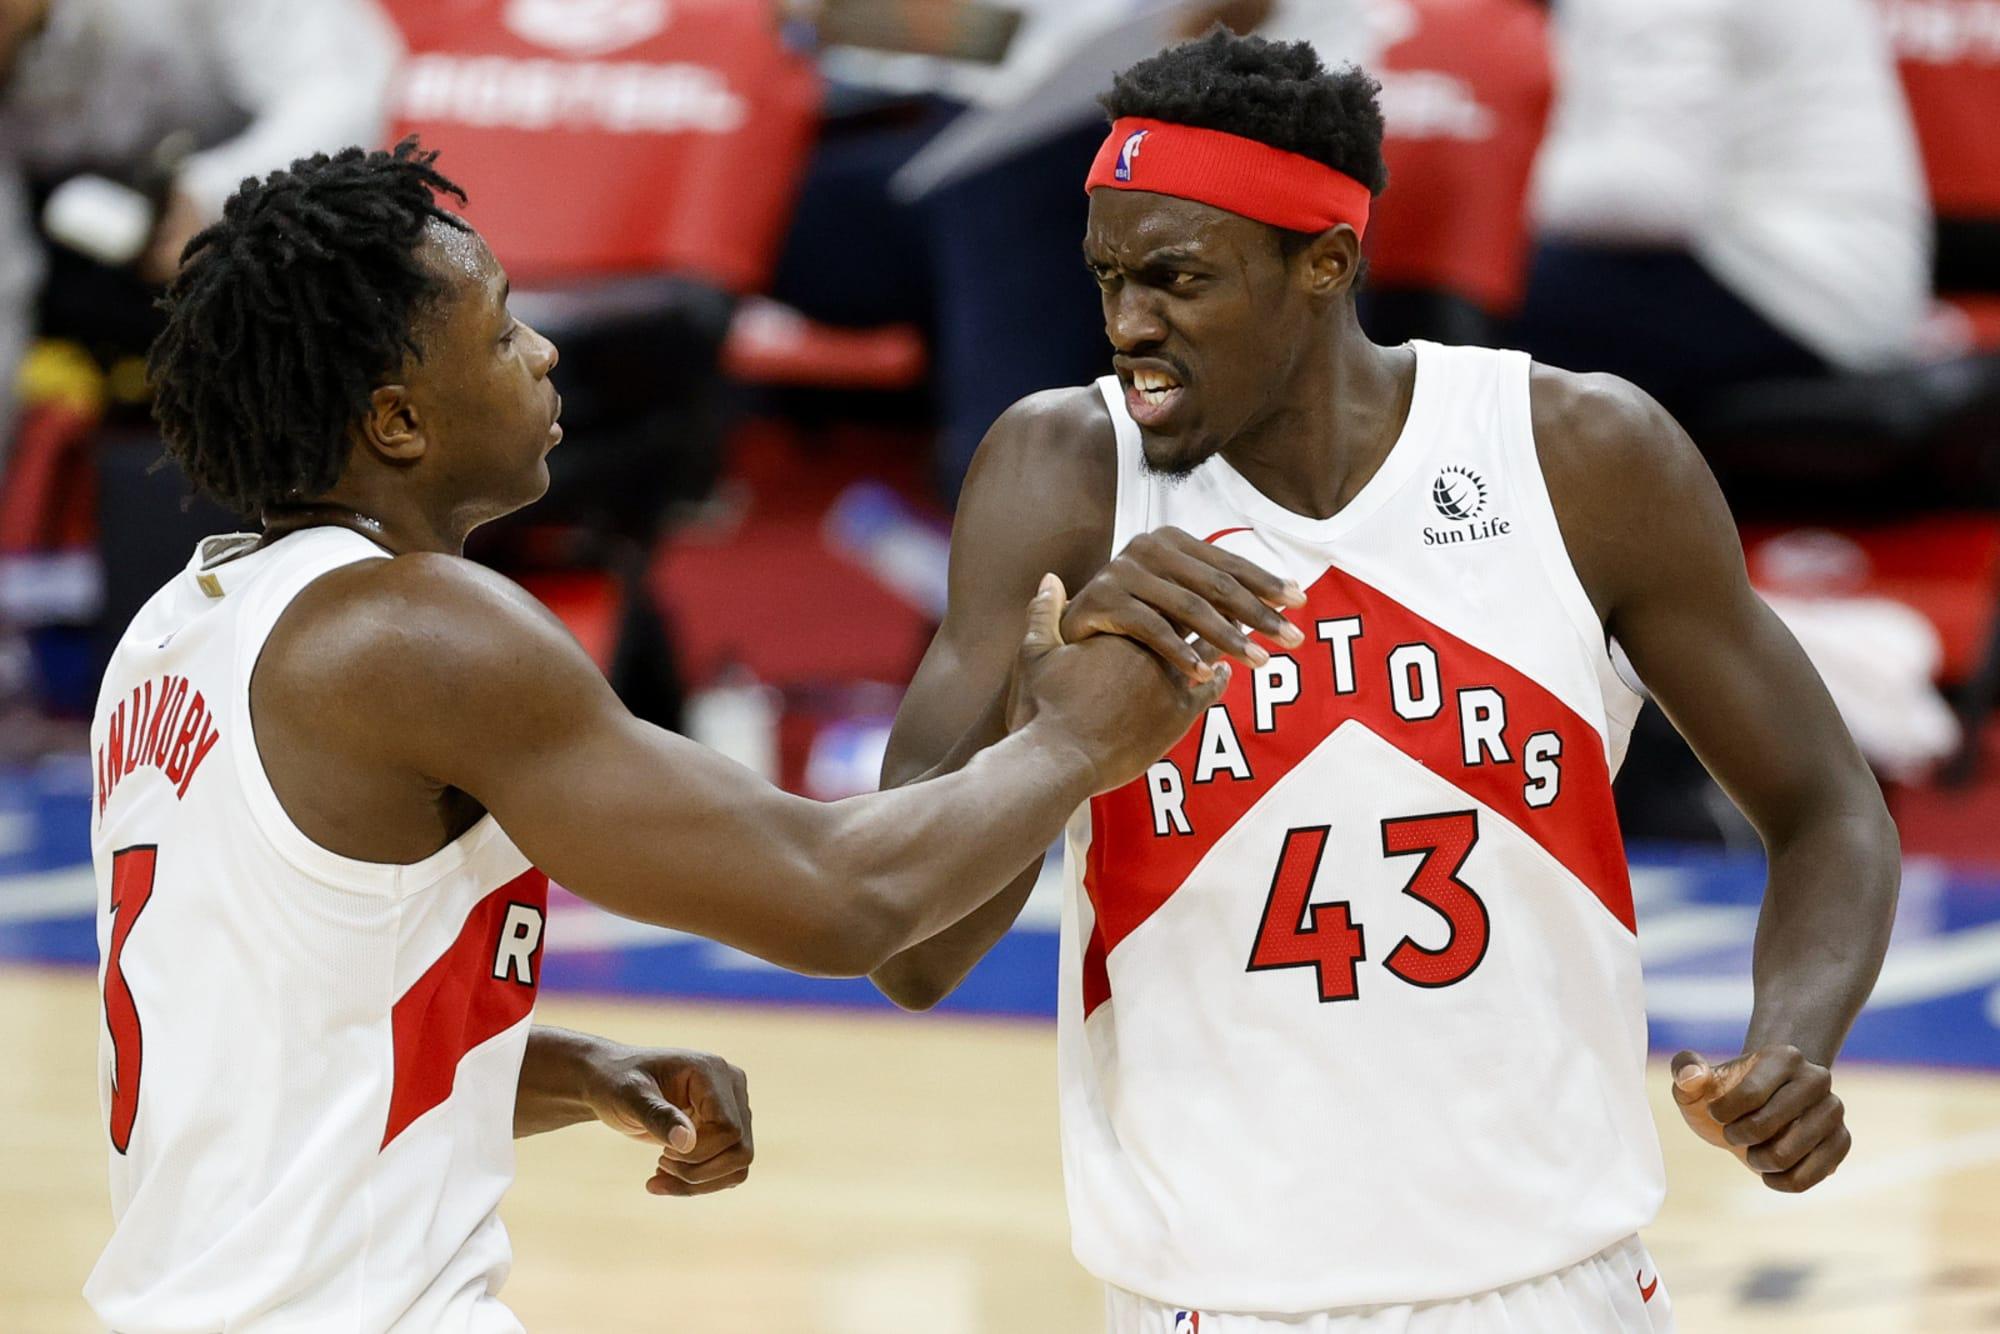 Toronto Raptors: Best and Worst case scenarios for the rotation bigs